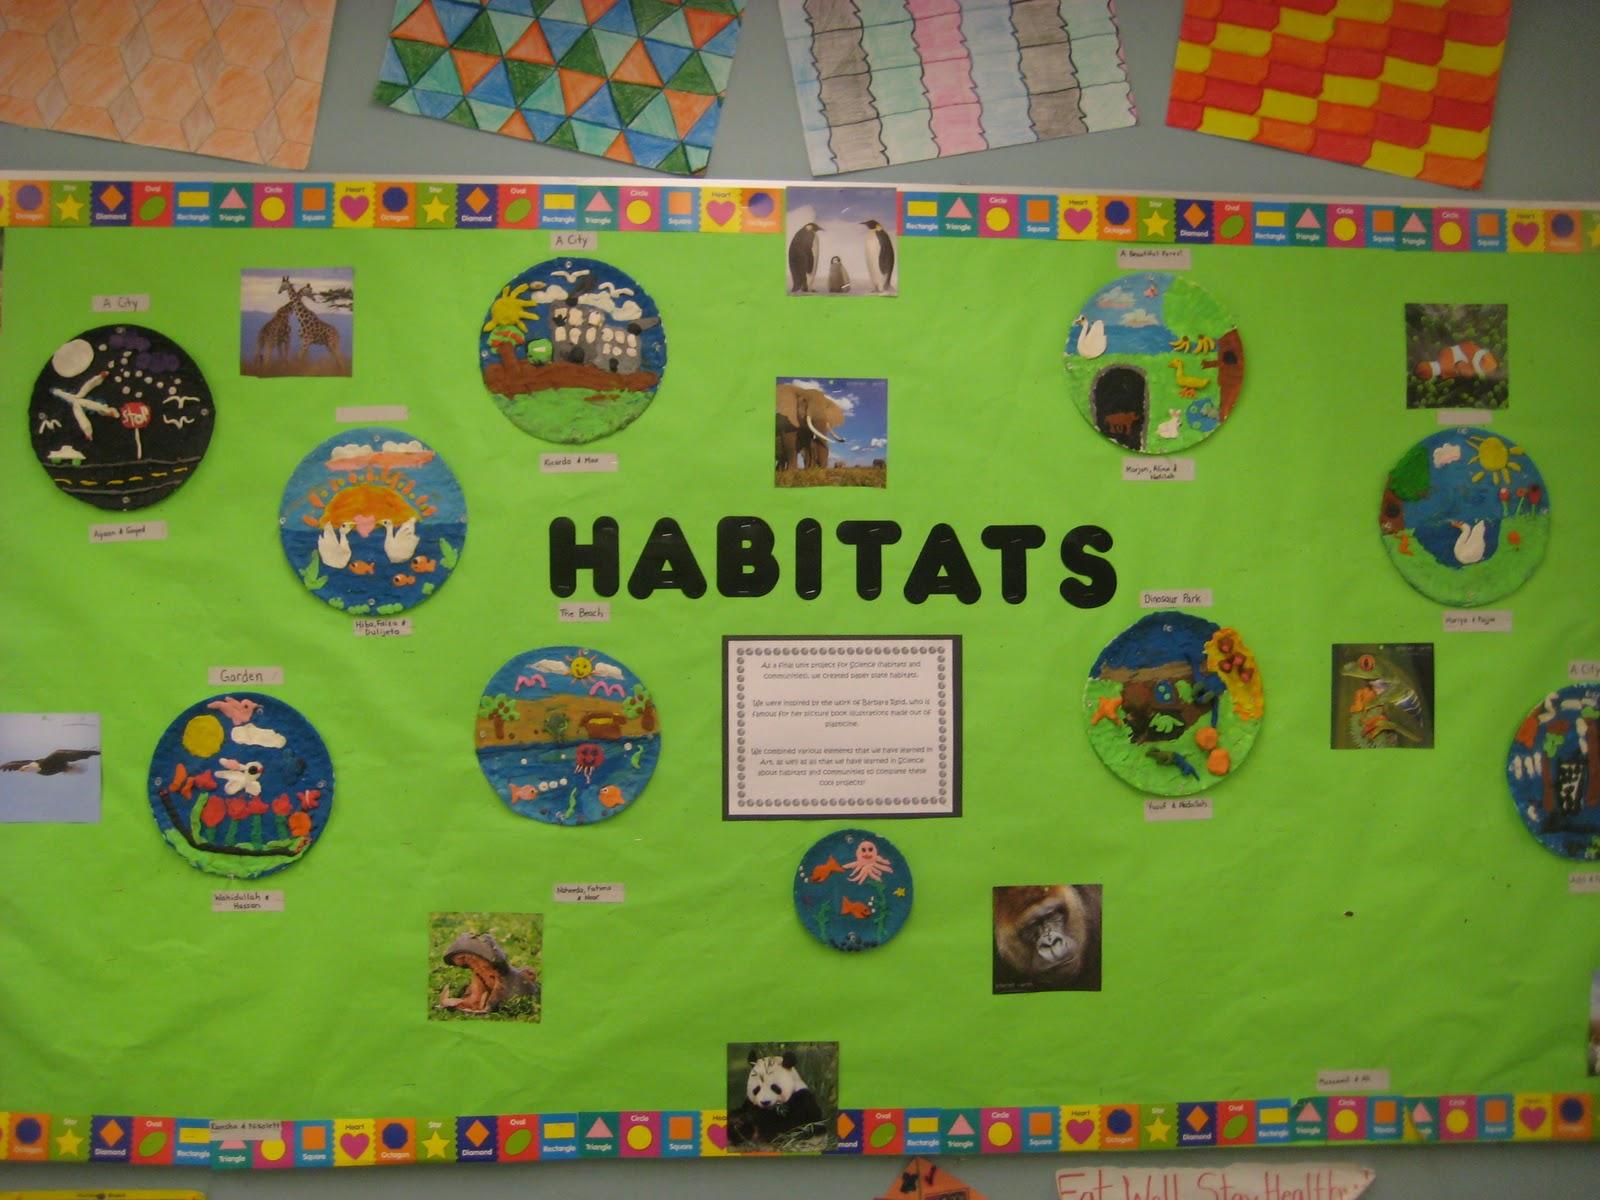 Msrji S Grade 4 Class Habitat Projects Are Complete